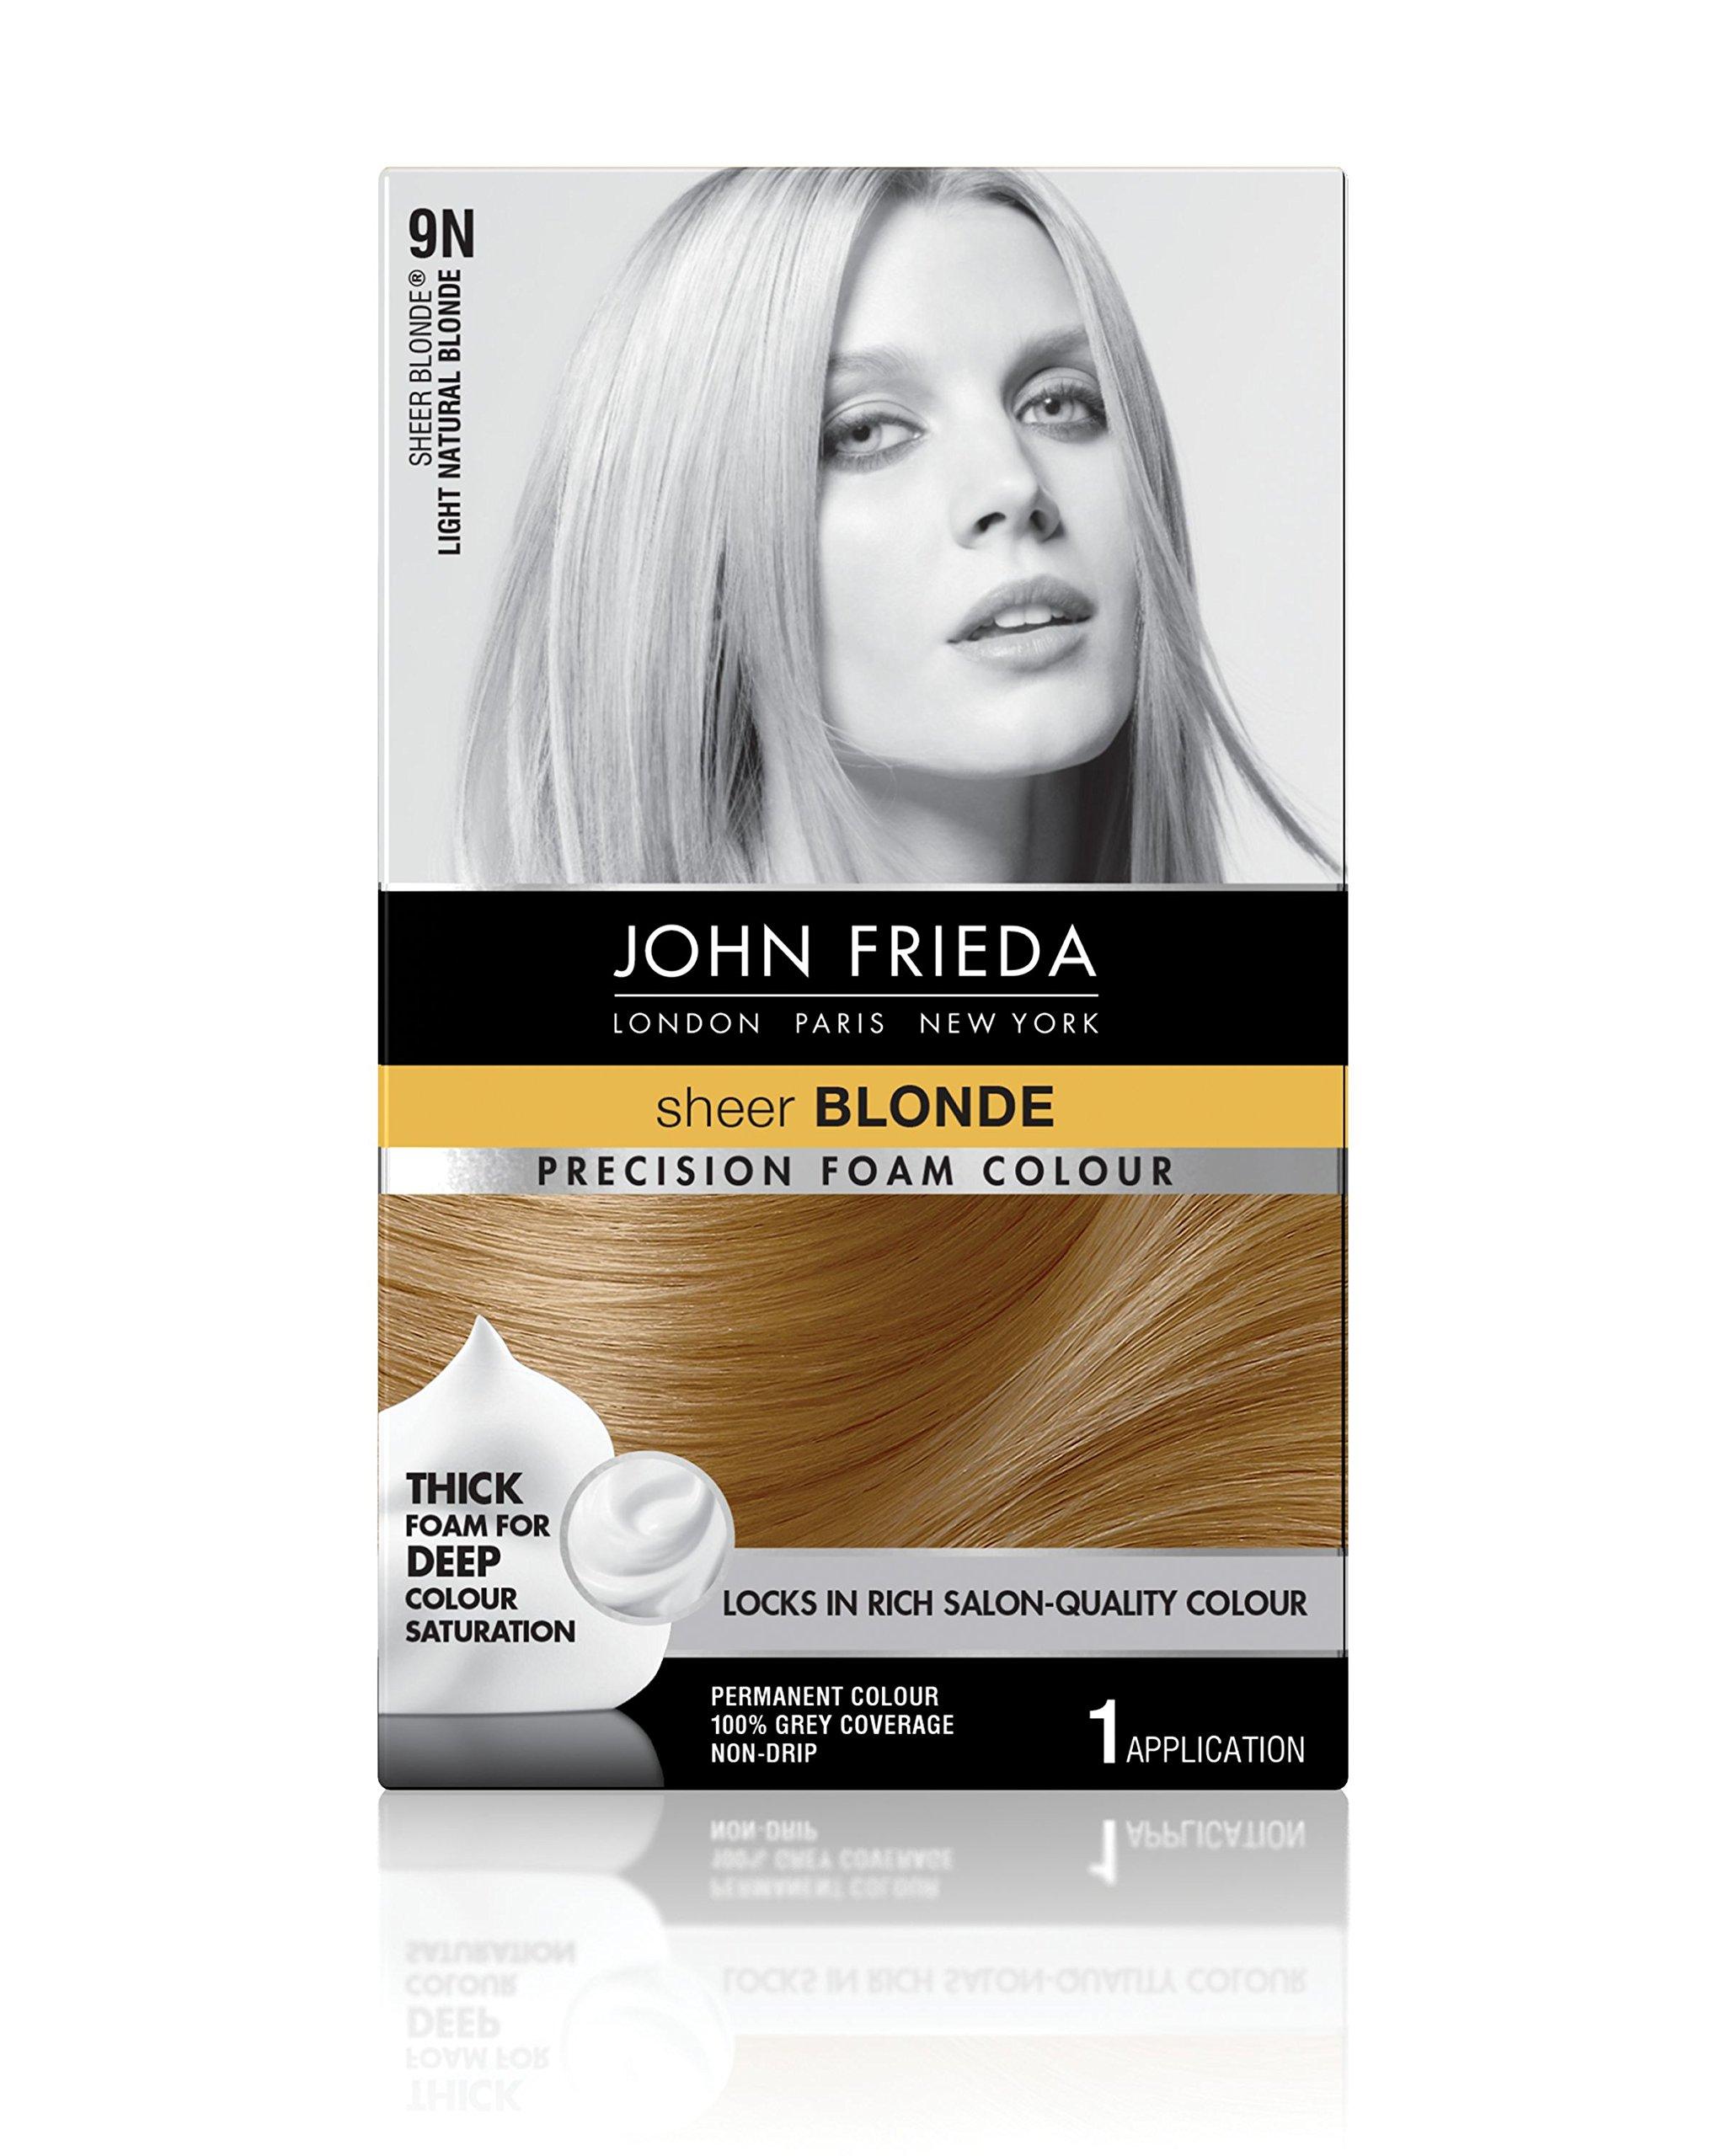 John Frieda Precision Foam Colour, Light Natural Blonde 9N by John Frieda